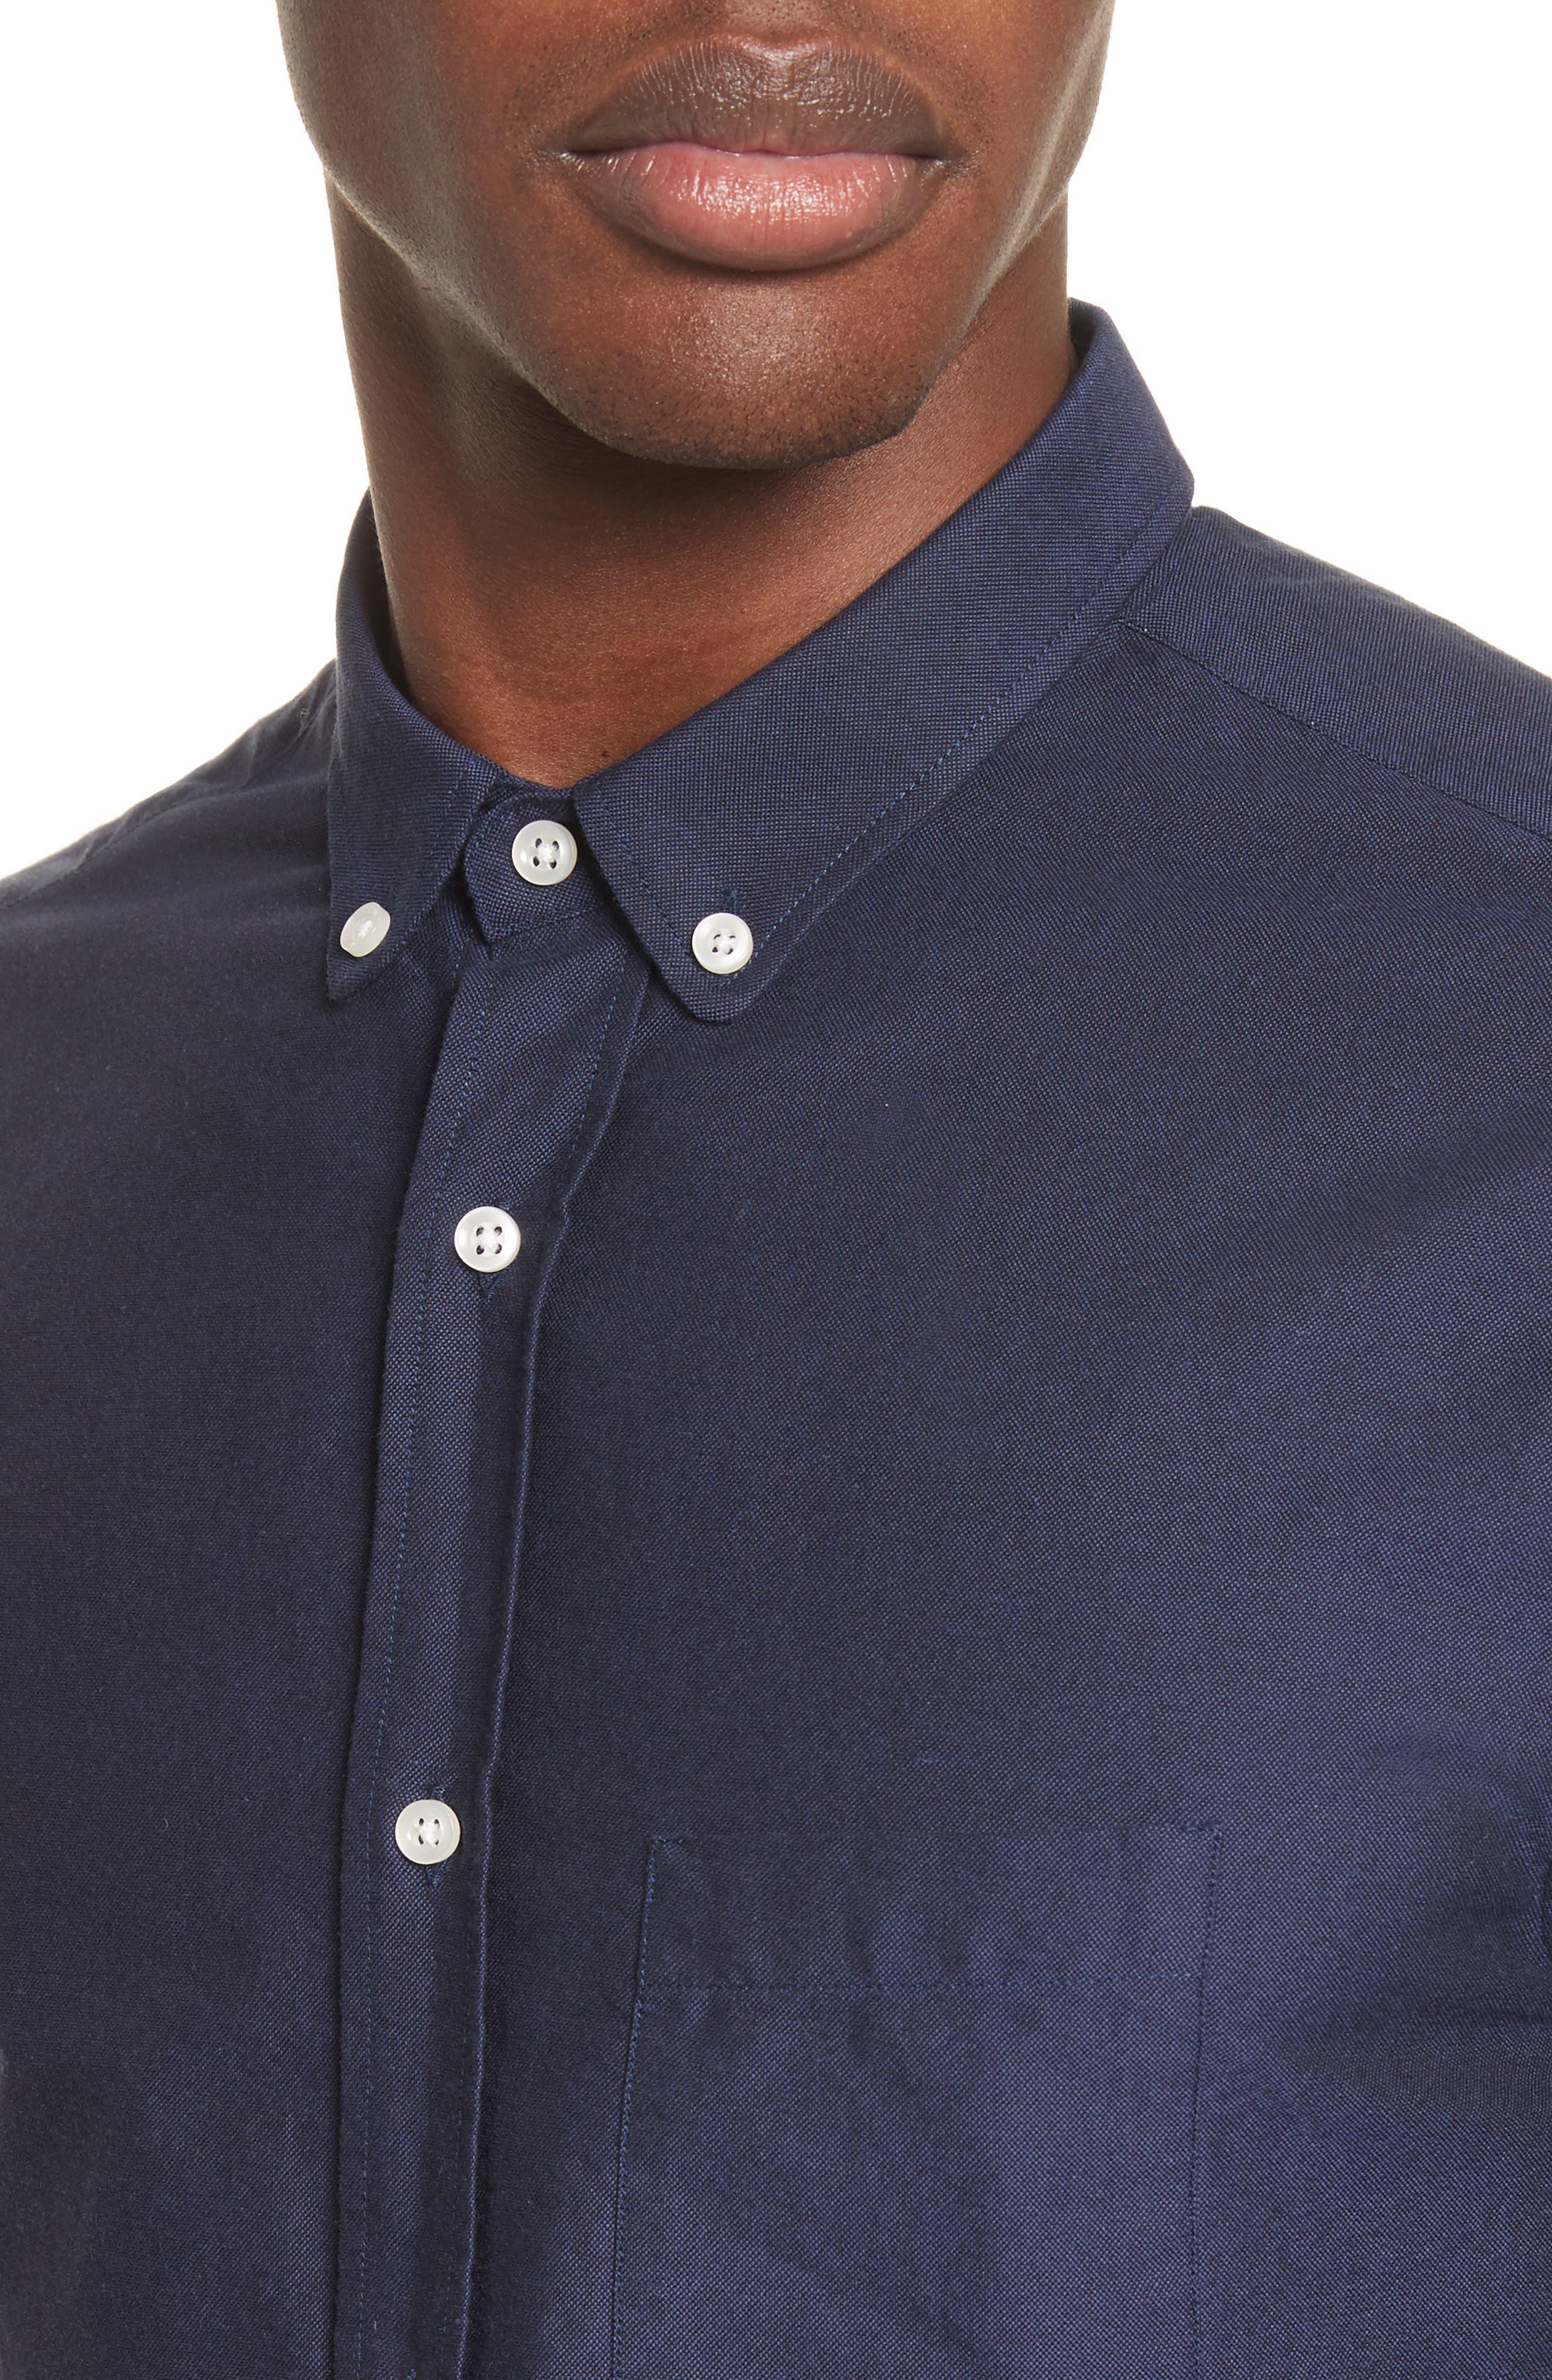 Oxford Shirt,                             Alternate thumbnail 5, color,                             410